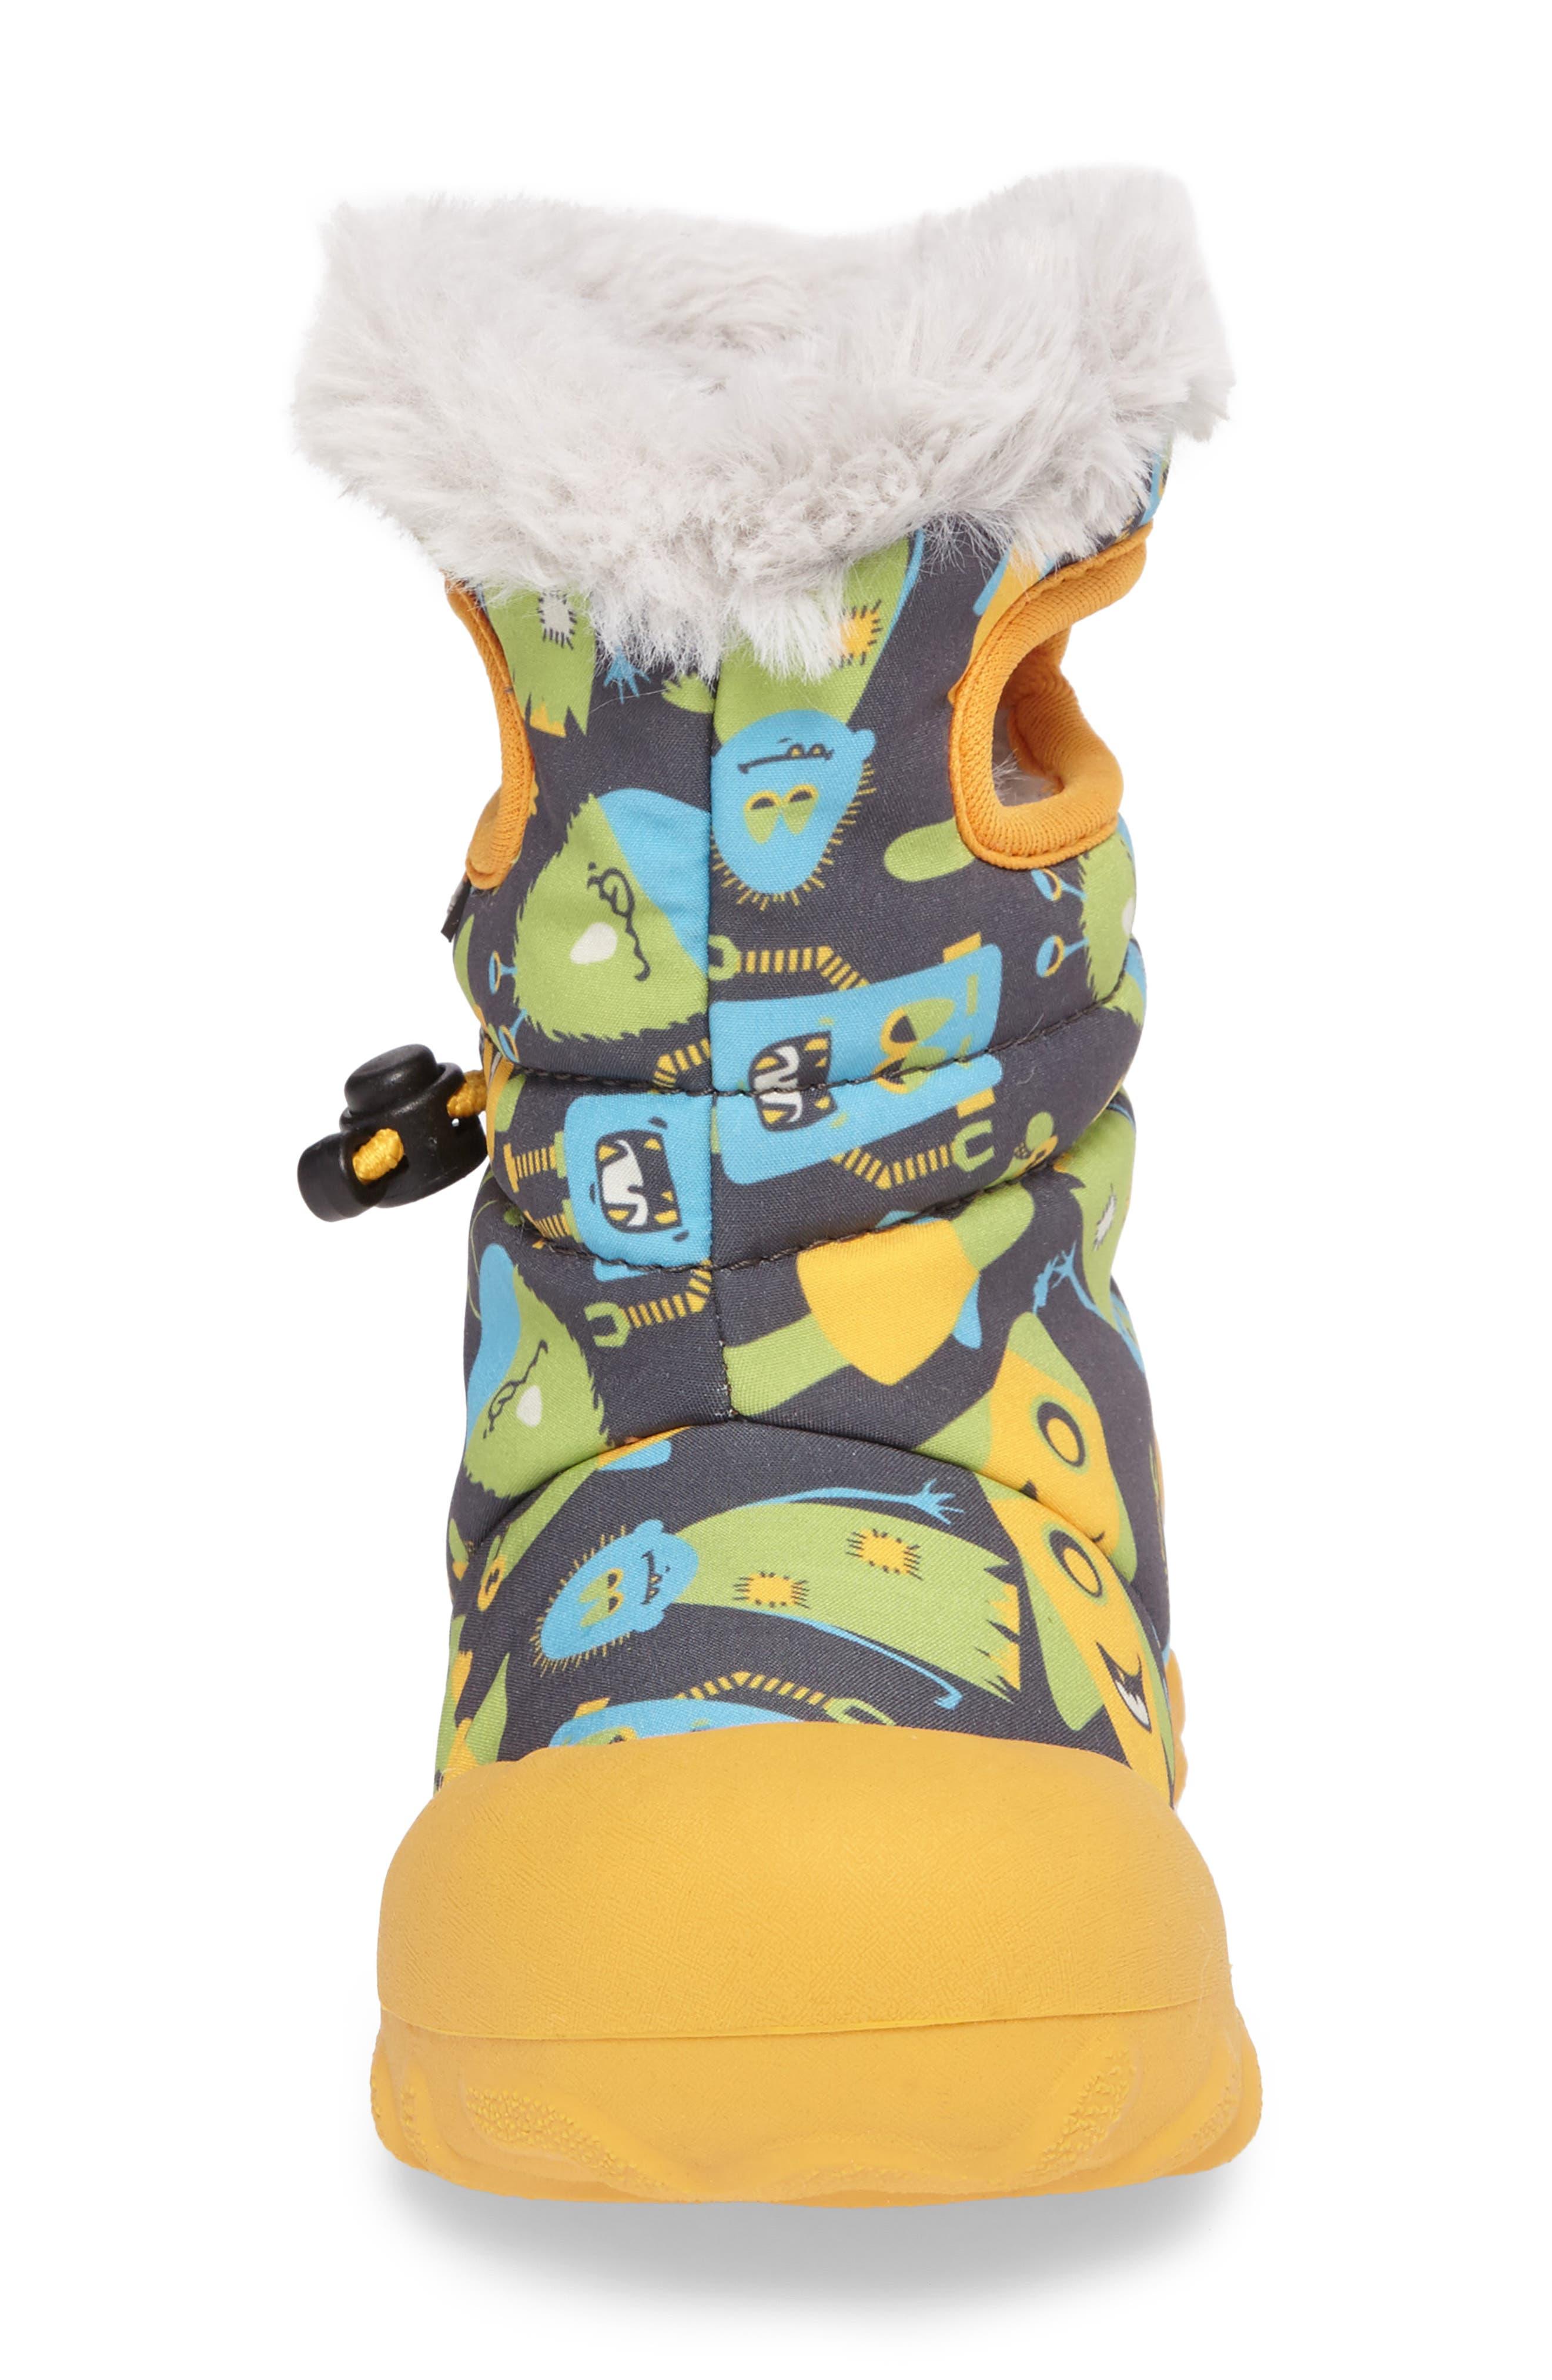 B-MOC Monsters Waterproof Insulated Faux Fur Winter Boot,                             Alternate thumbnail 4, color,                             Dark Gray Multi